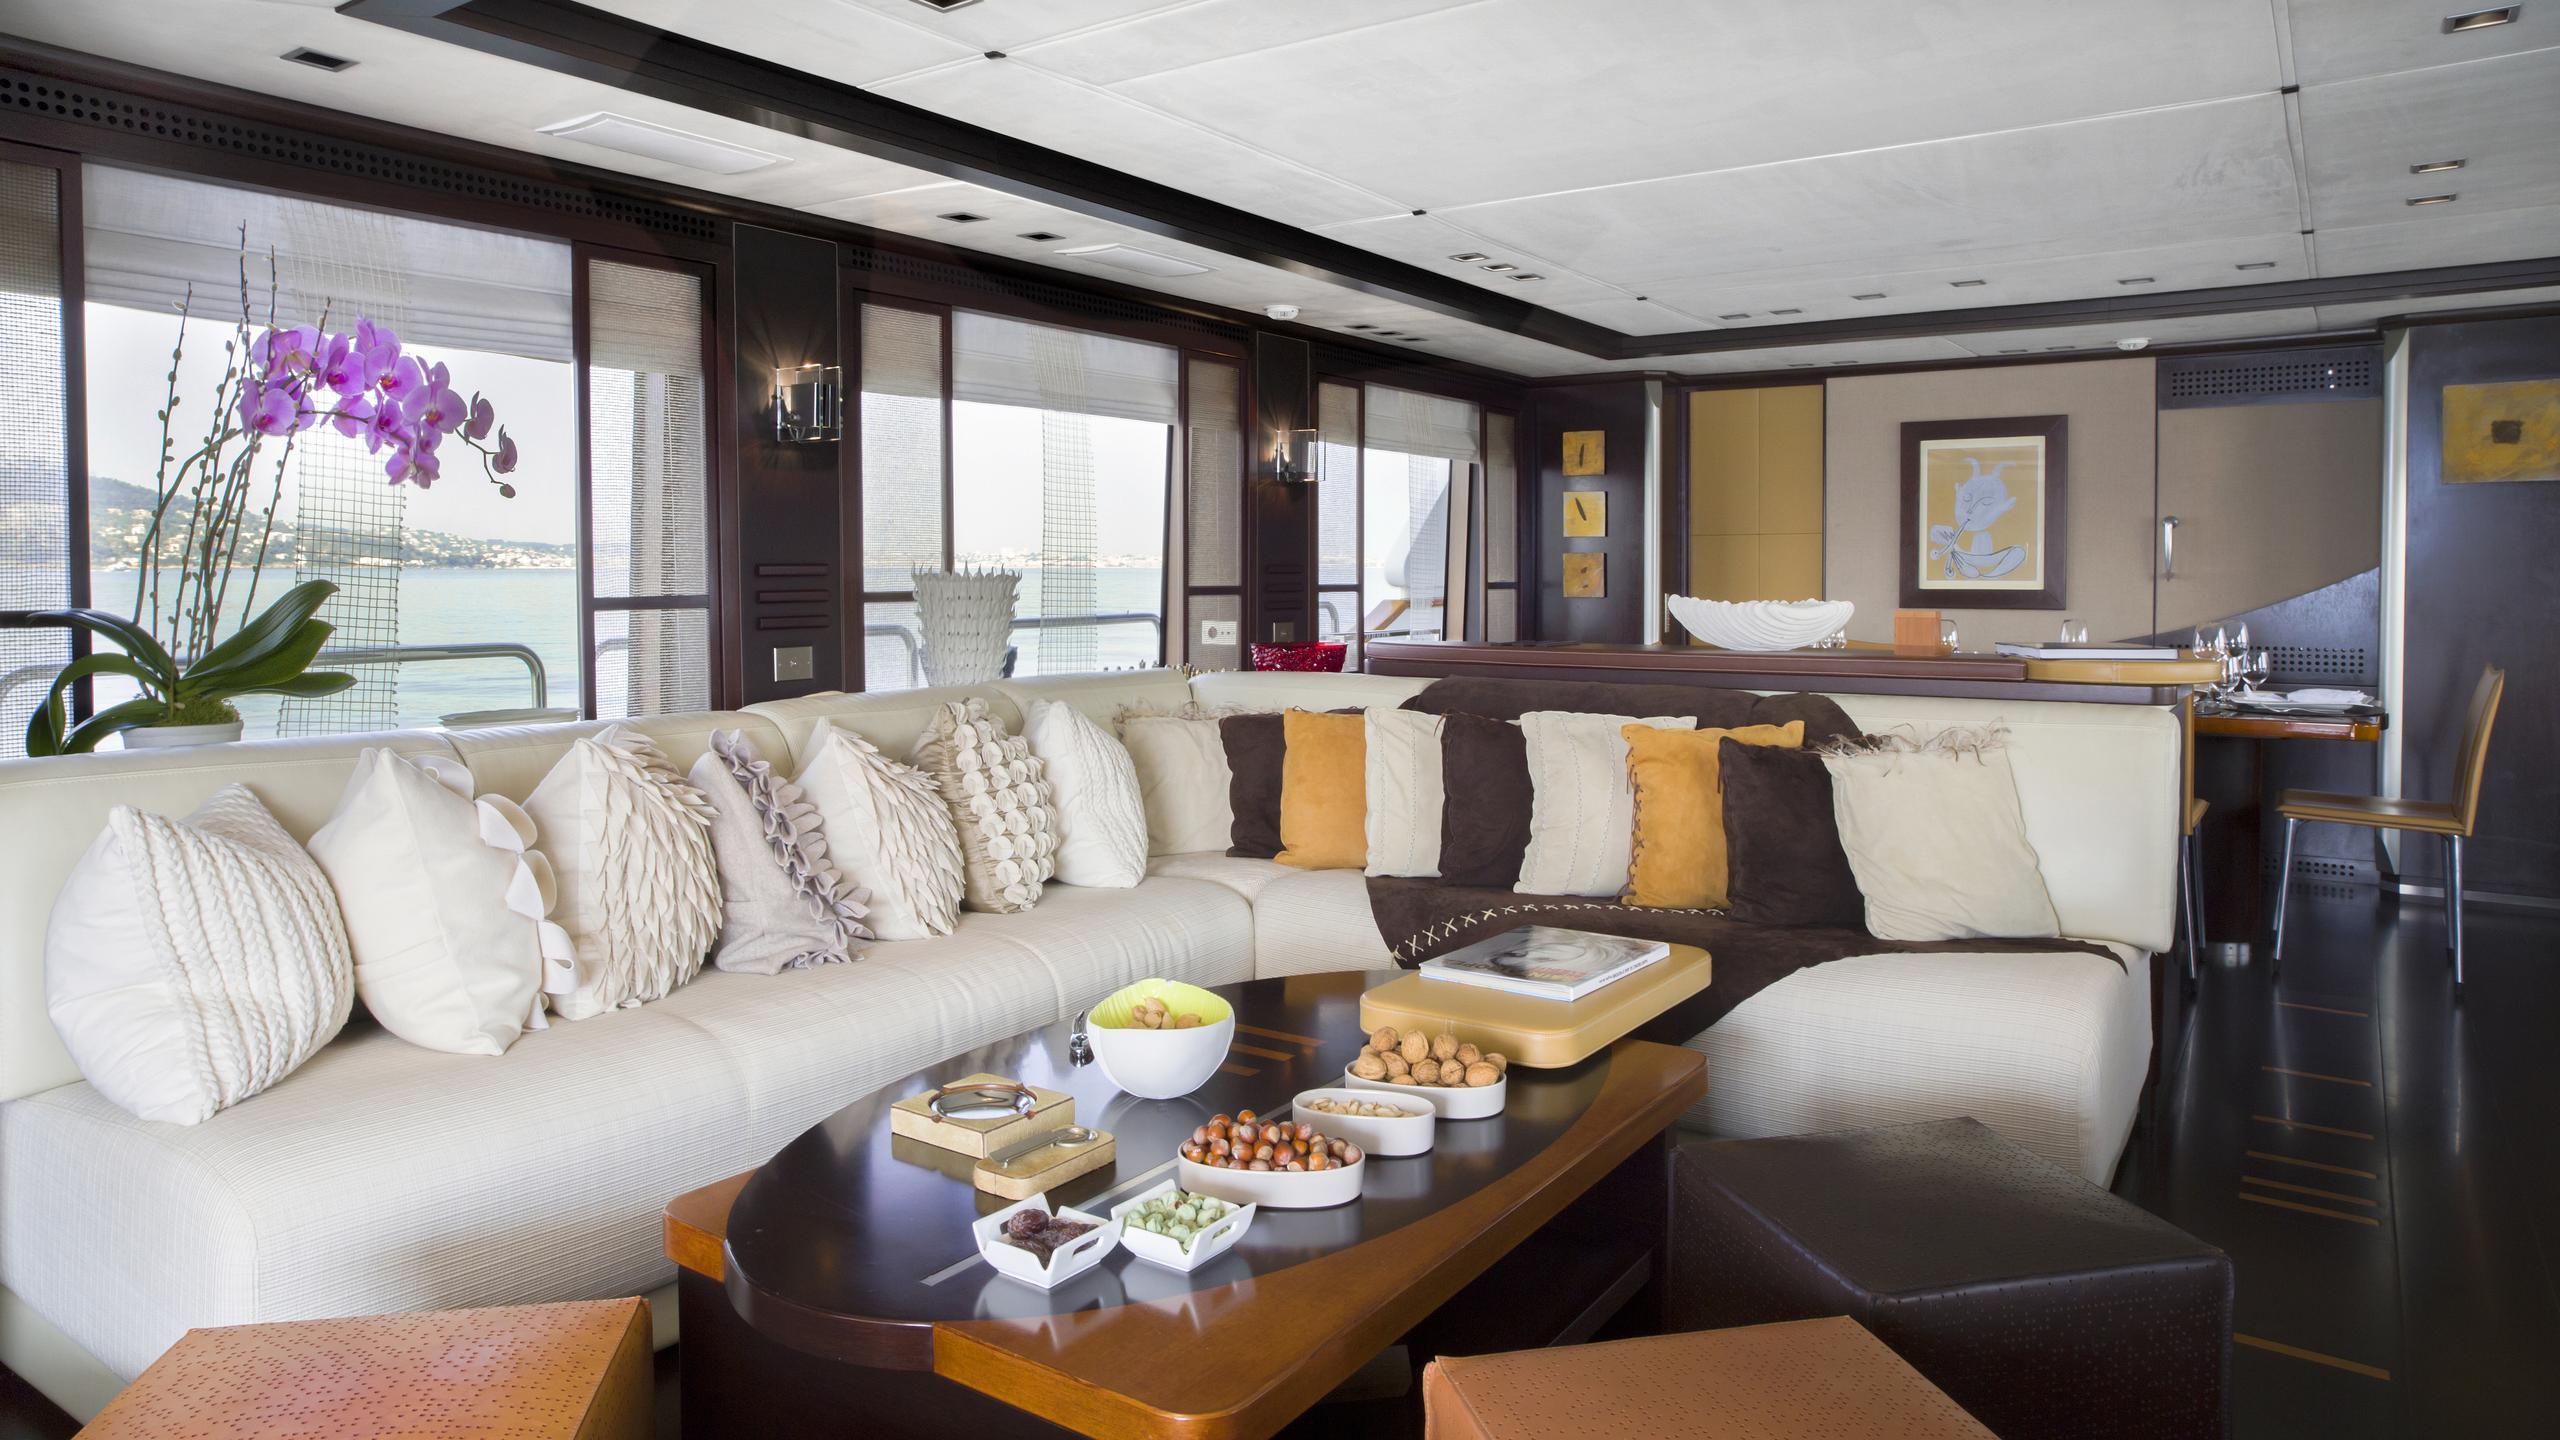 quid-pro-quo-yacht-saloon